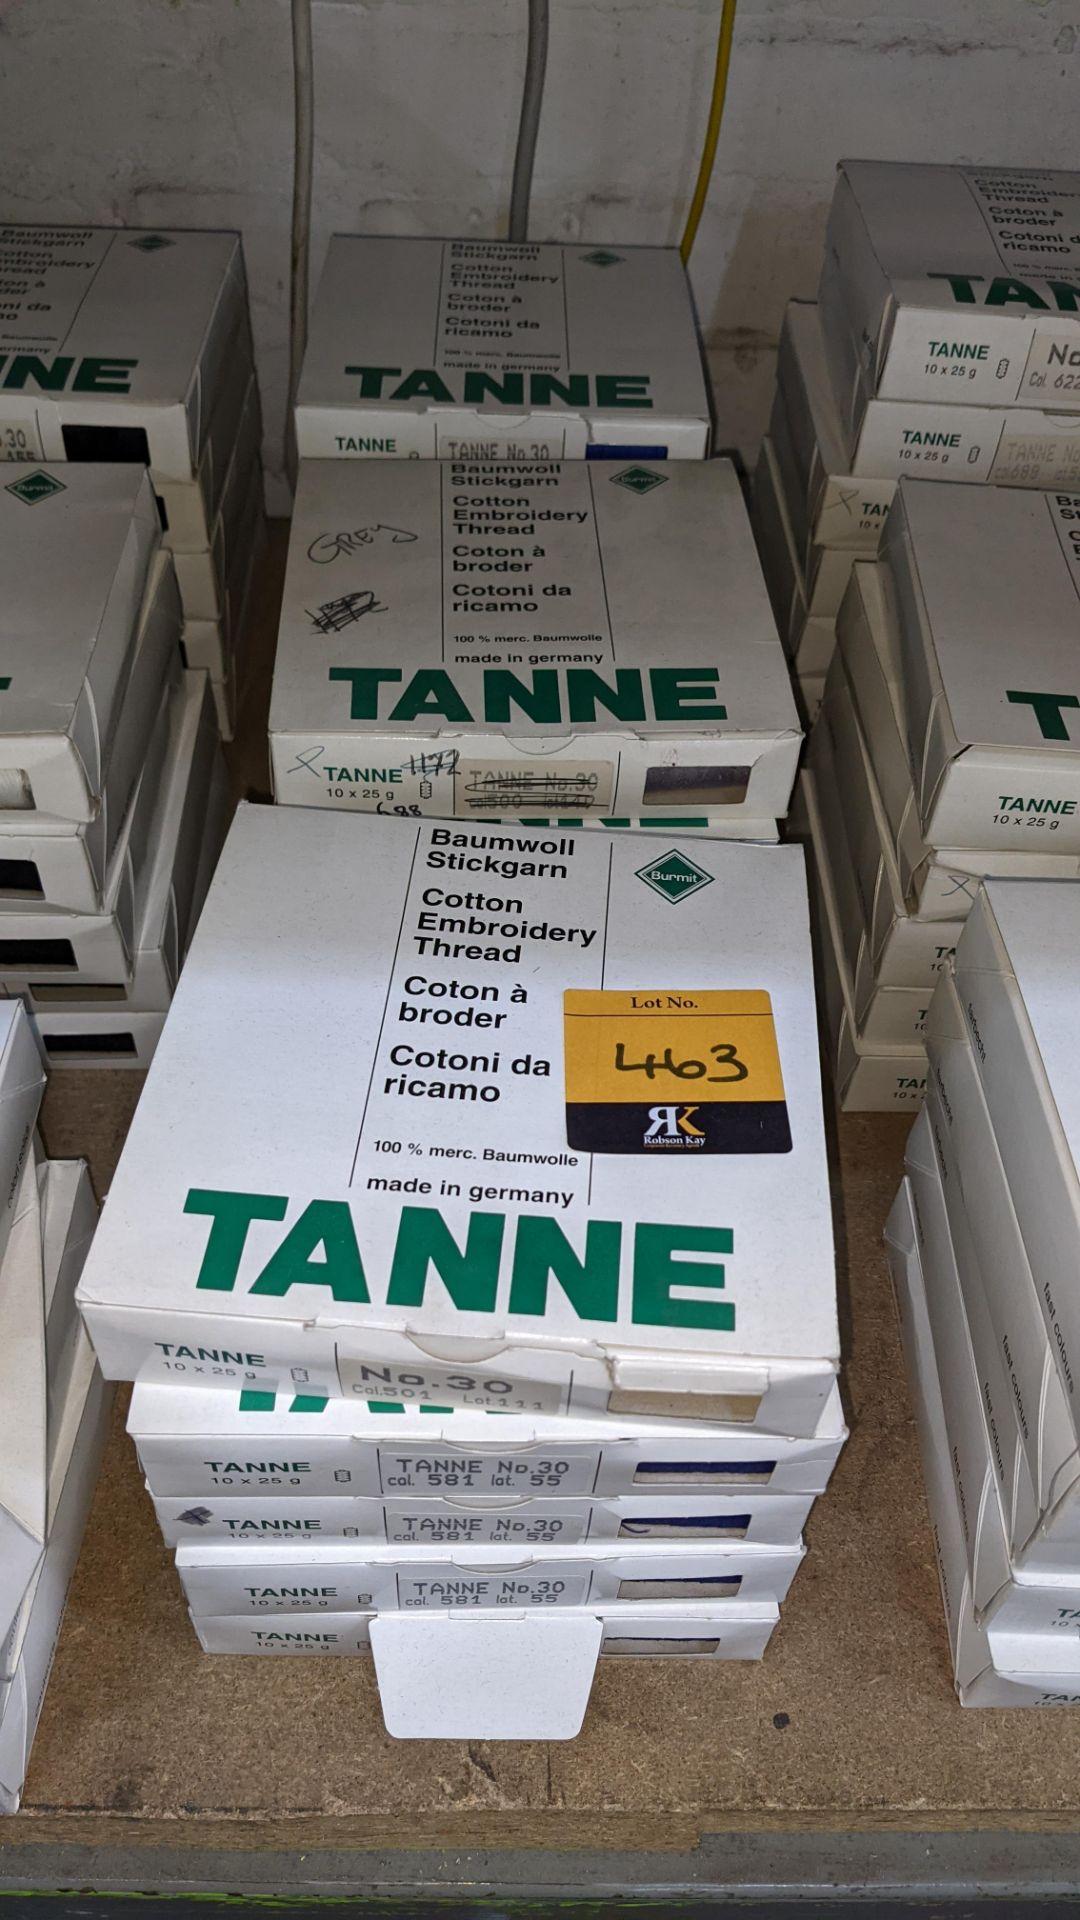 15 boxes of Madeira Tanne (Burmit) cotton embroidery thread